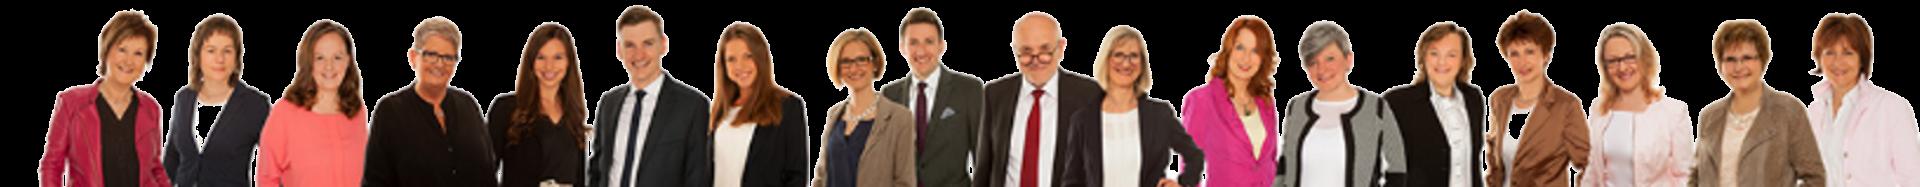 Teamfoto der Steuerkanzlei Thomas Lang